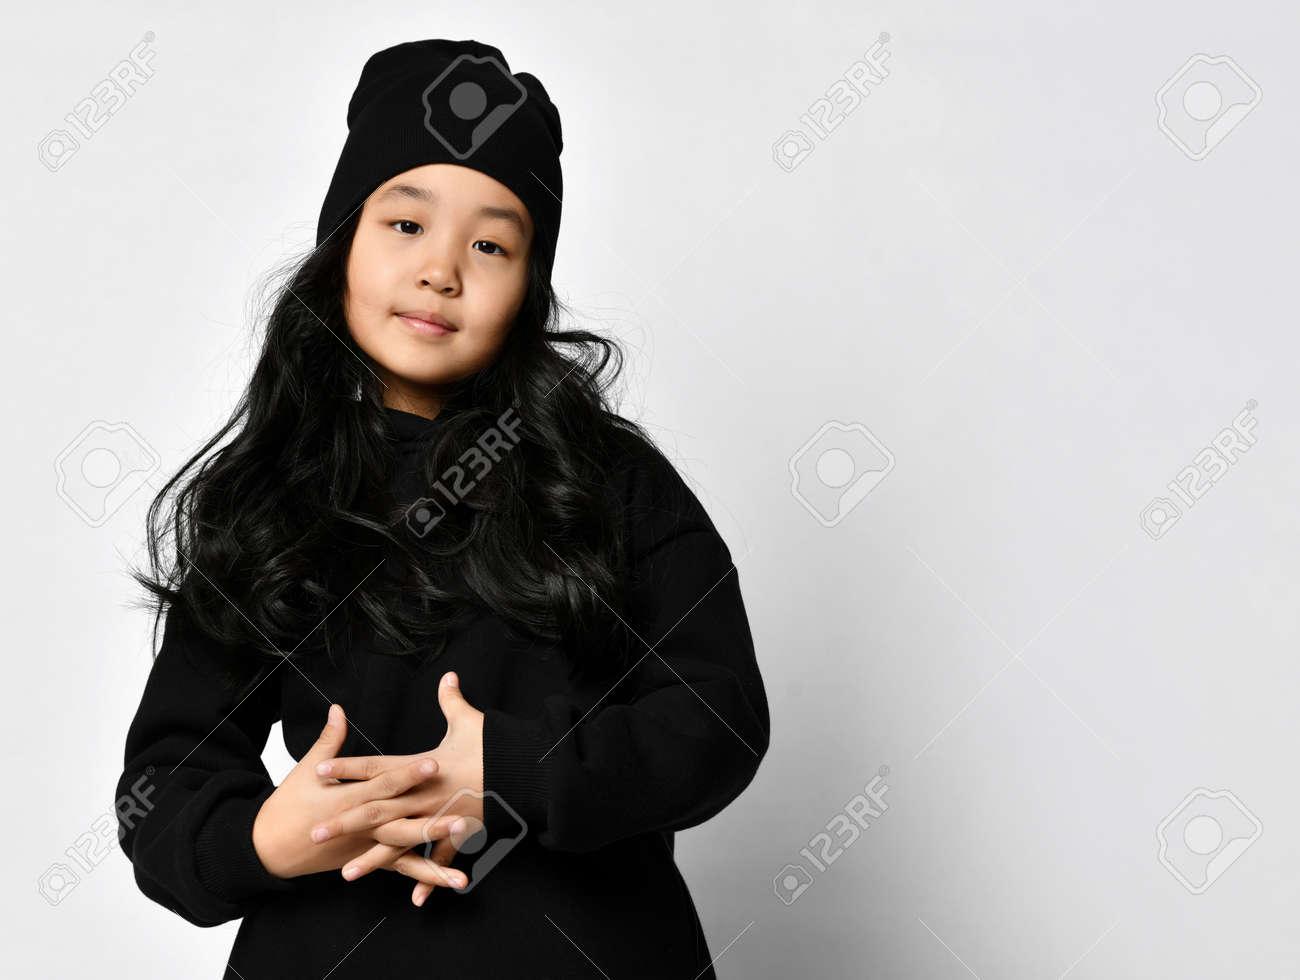 Preteen asian girl posing for camera studio headshot portrait - 166627512